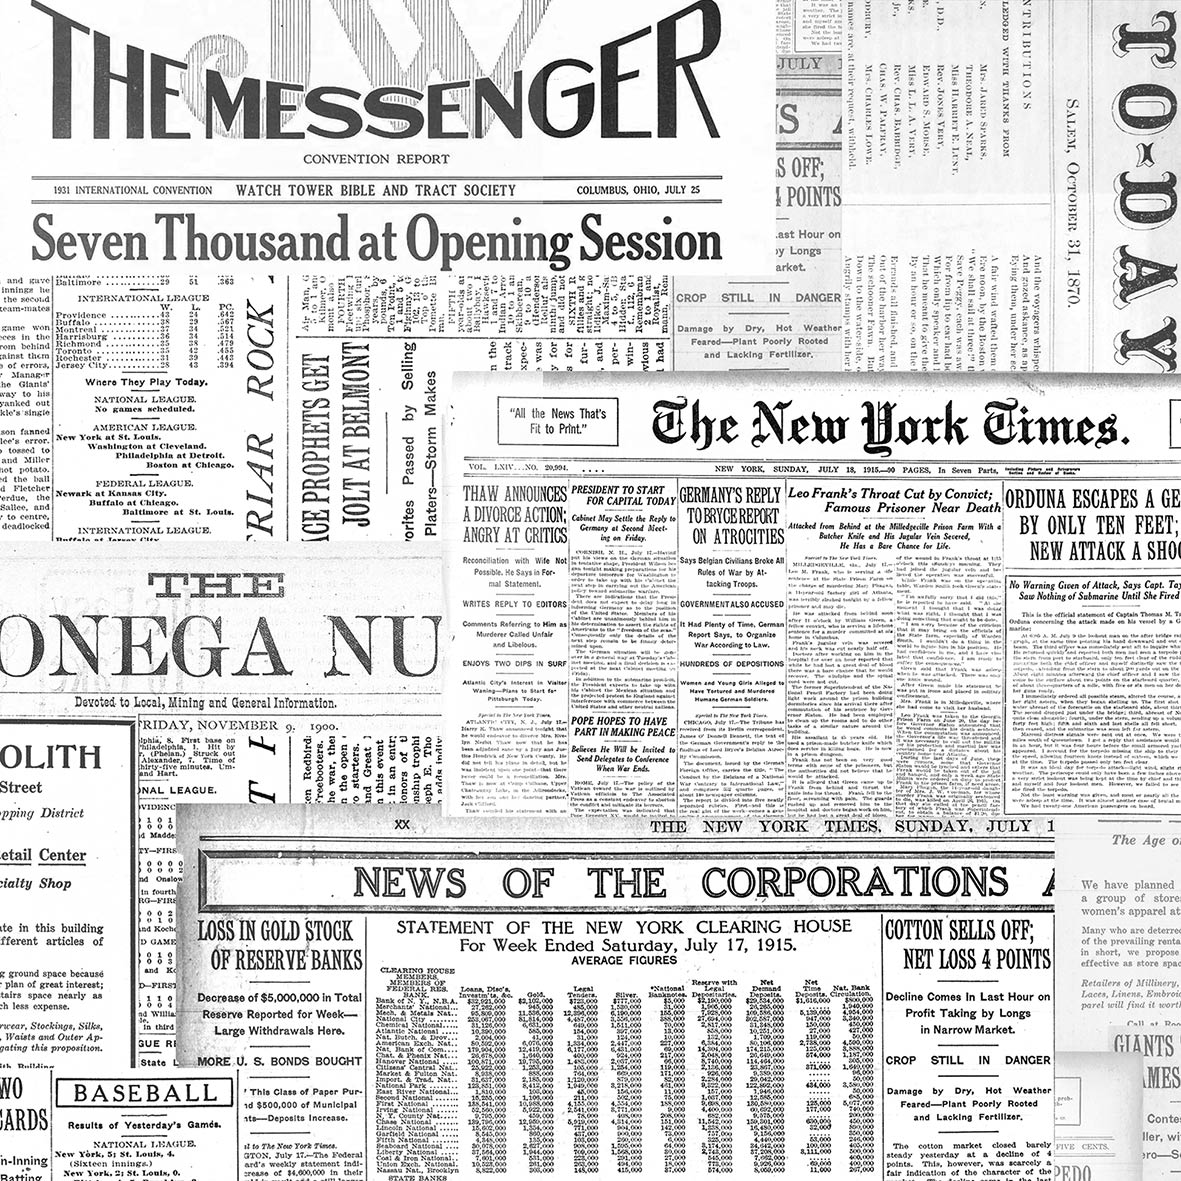 The Messenger 33x33 cm